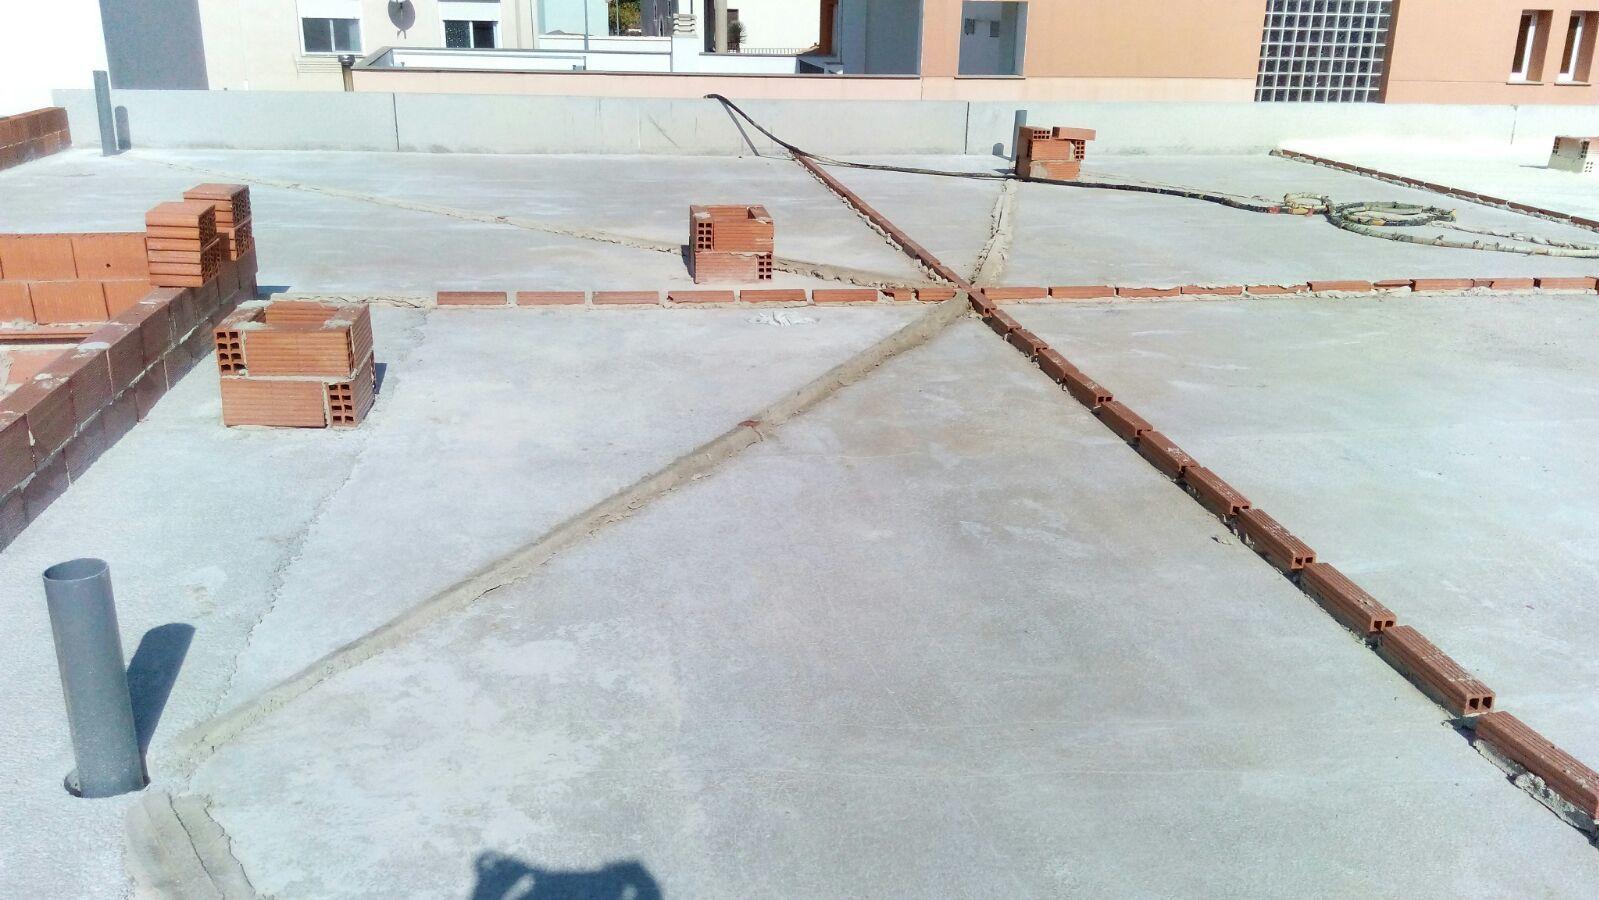 Foto 36 de Aislamientos acústicos y térmicos en Rafelcofer | Aislamientos de Poliuretano Jaime Femenia